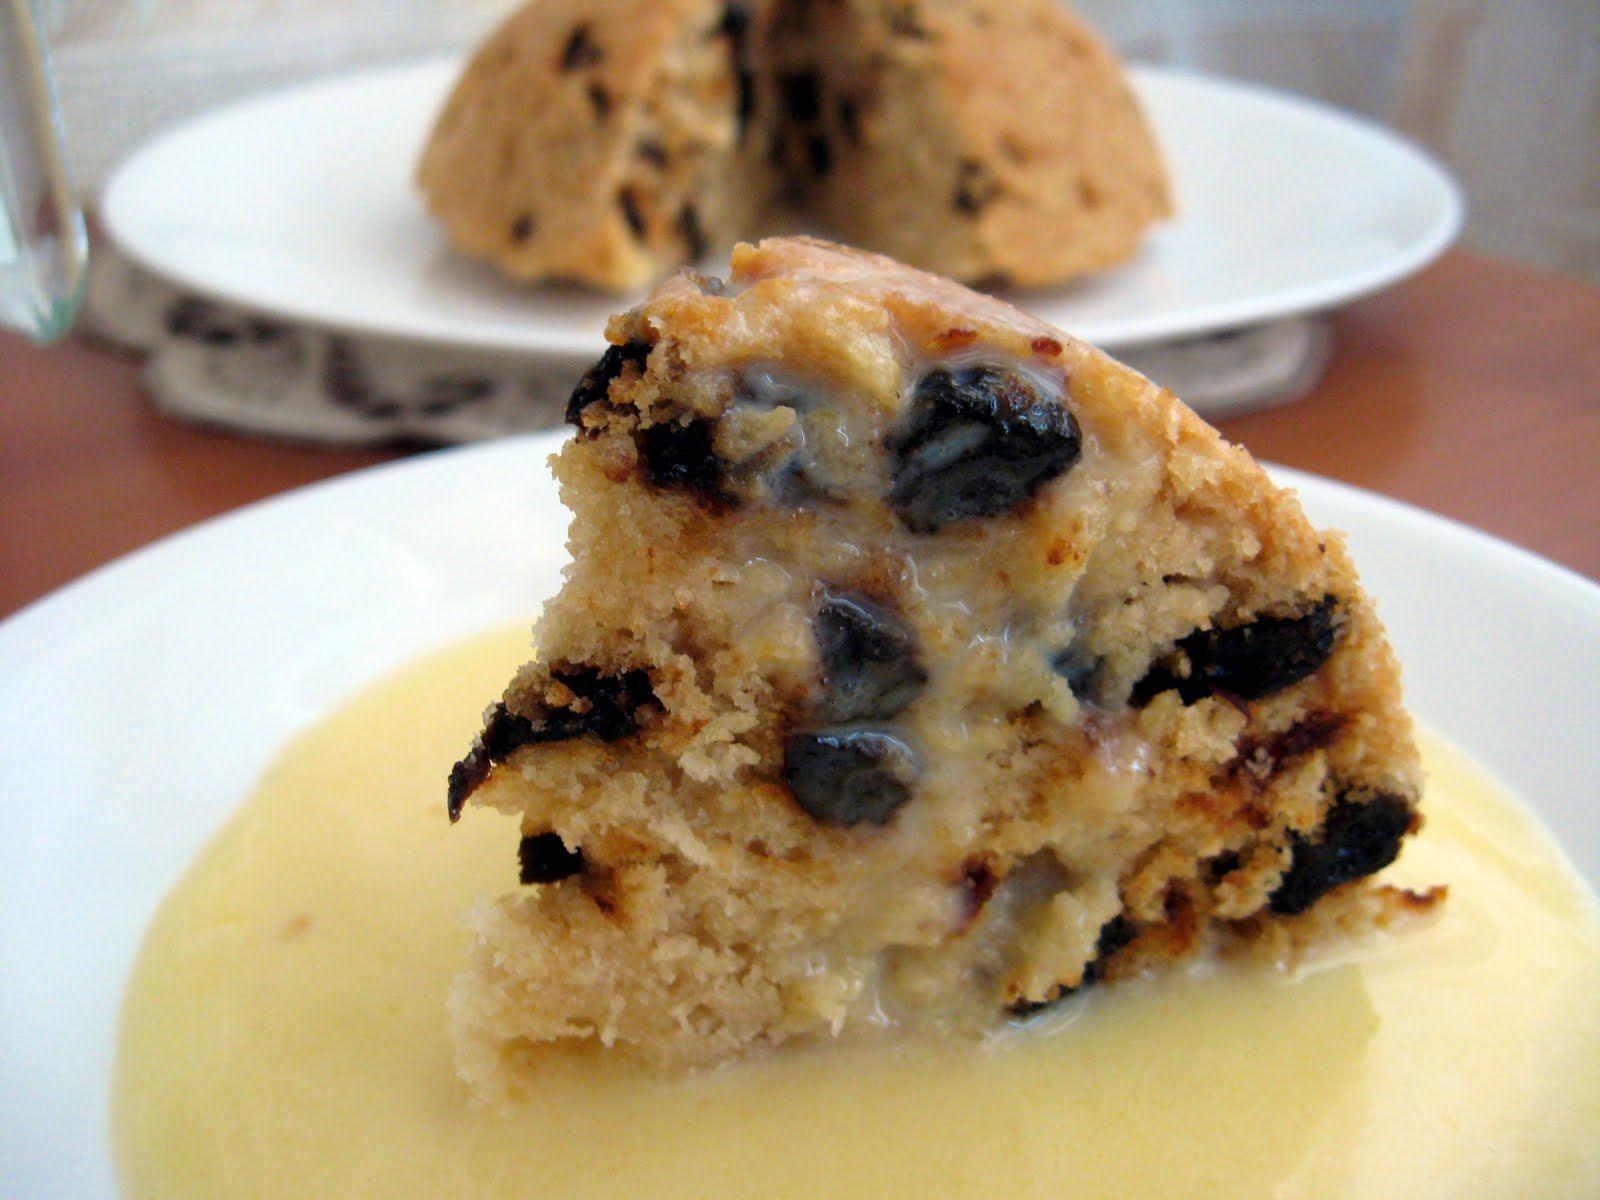 My Food Affair: English pudding-Daring Baker